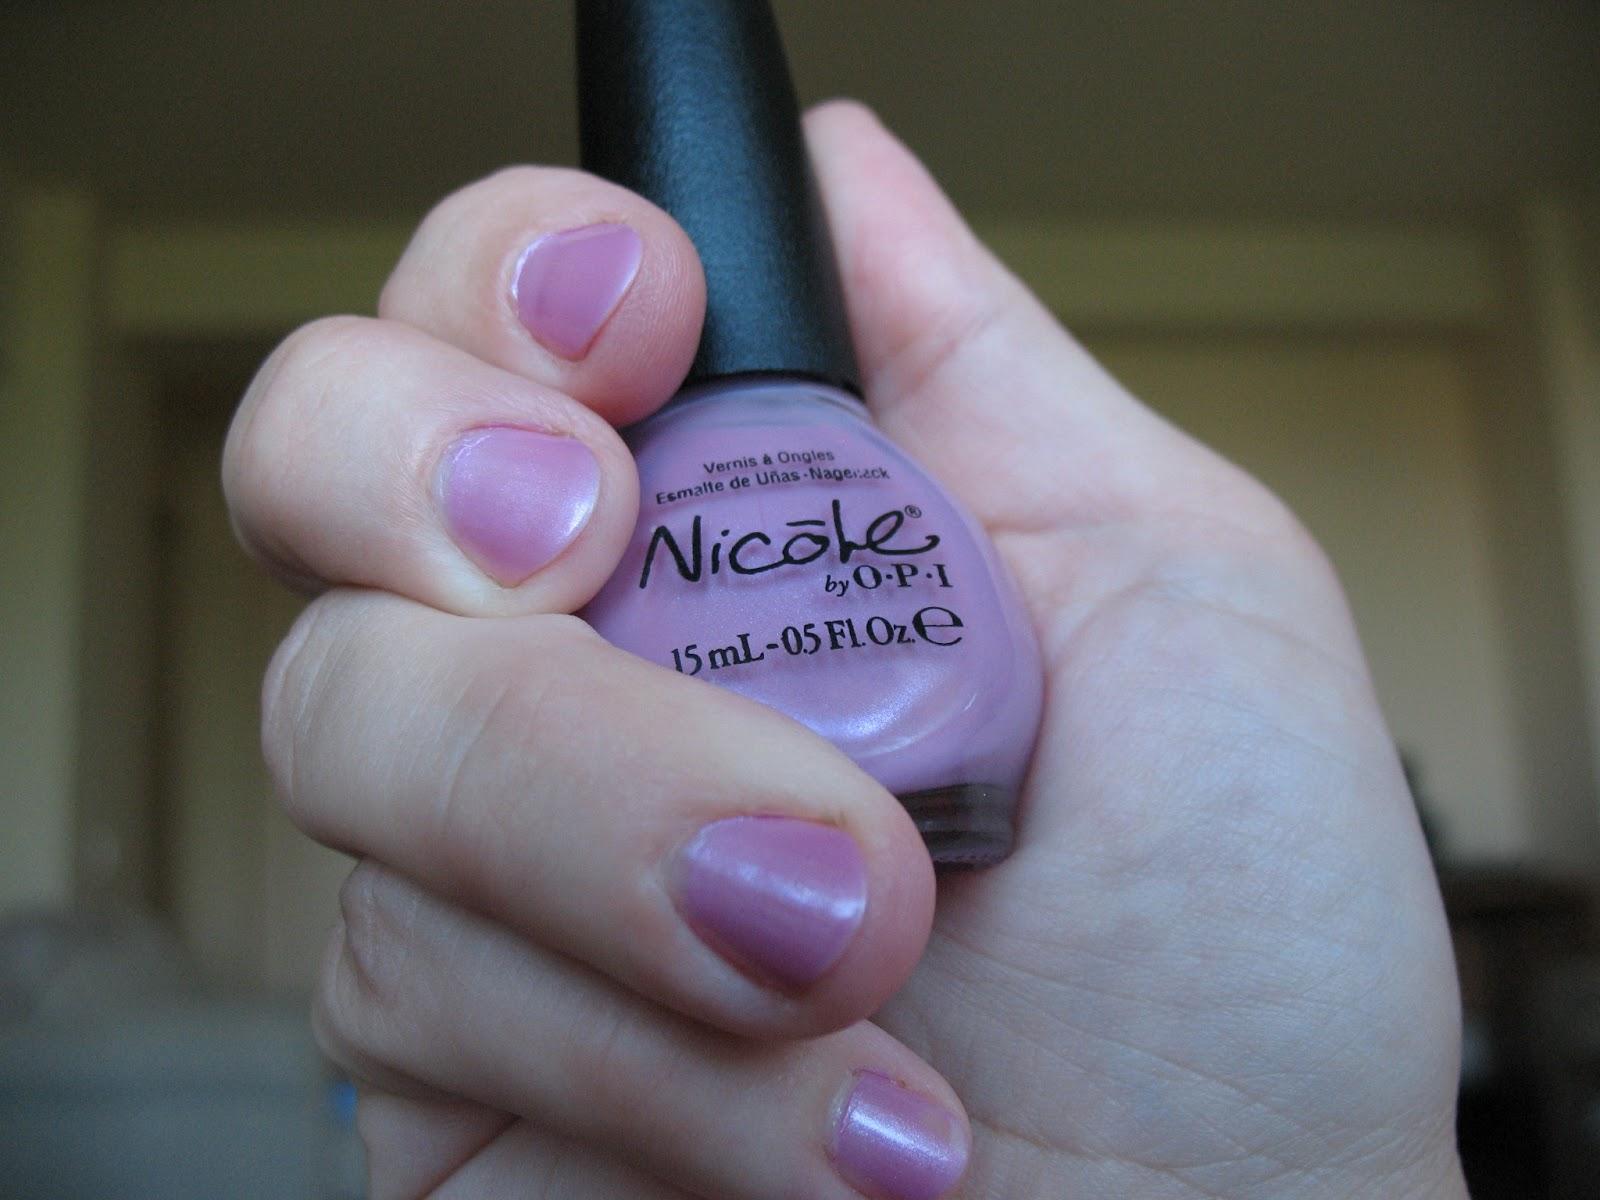 Beauty Belle Notes - Romanian beauty blog focusing on makeup ...